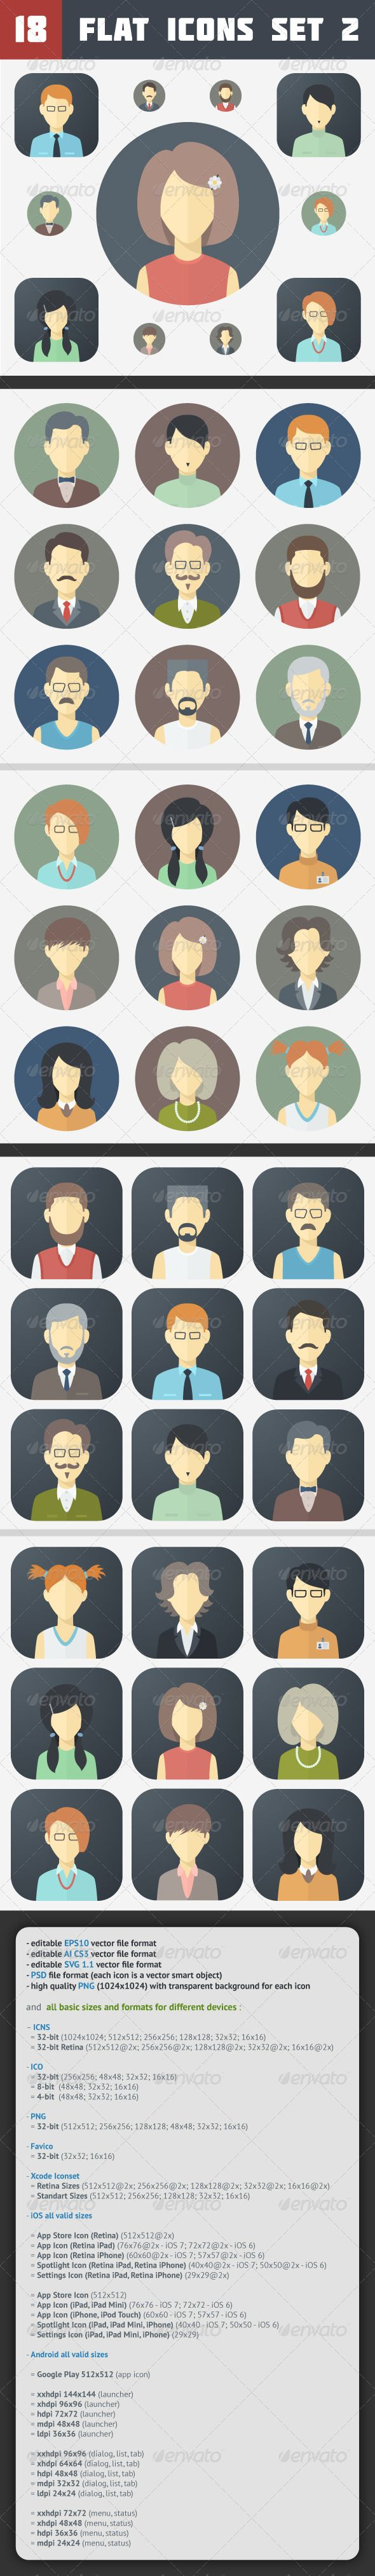 Minimalistic Flat Faces Icons | Buy and Download: http://graphicriver.net/item/minimalistic-flat-faces-icons-set-2/7093110?WT.ac=category_thumb&WT.z_author=MastakA&ref=ksioks